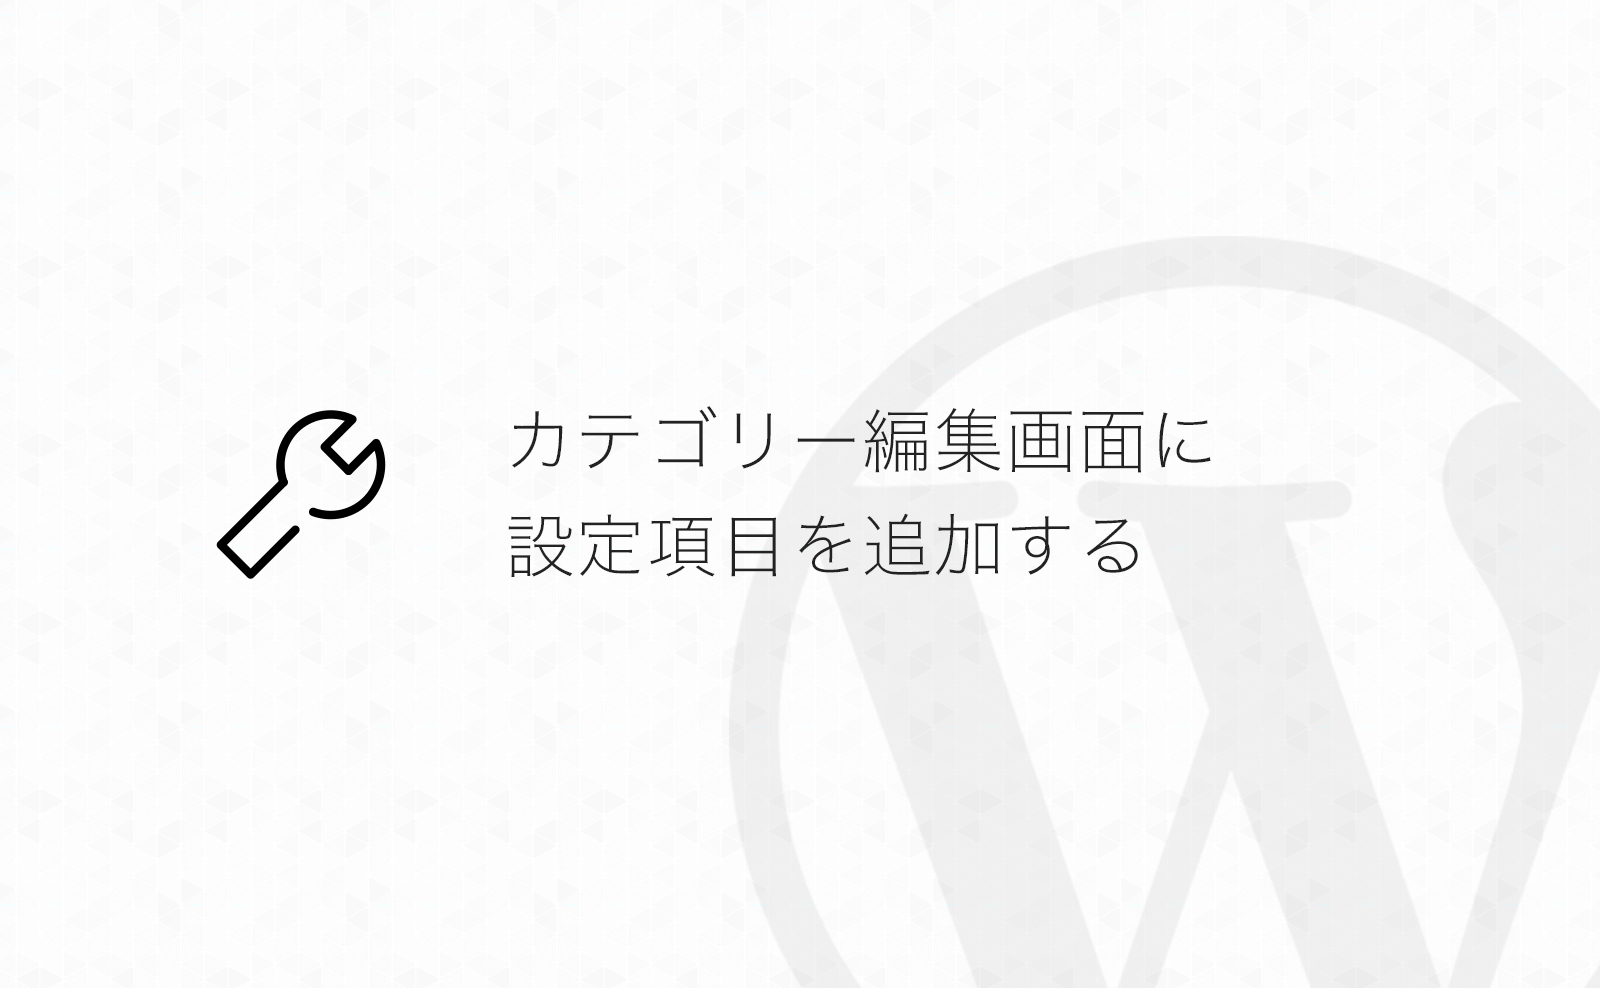 【WordPress】カテゴリー(タクソノミー)編集画面に独自の設定項目を追加する方法